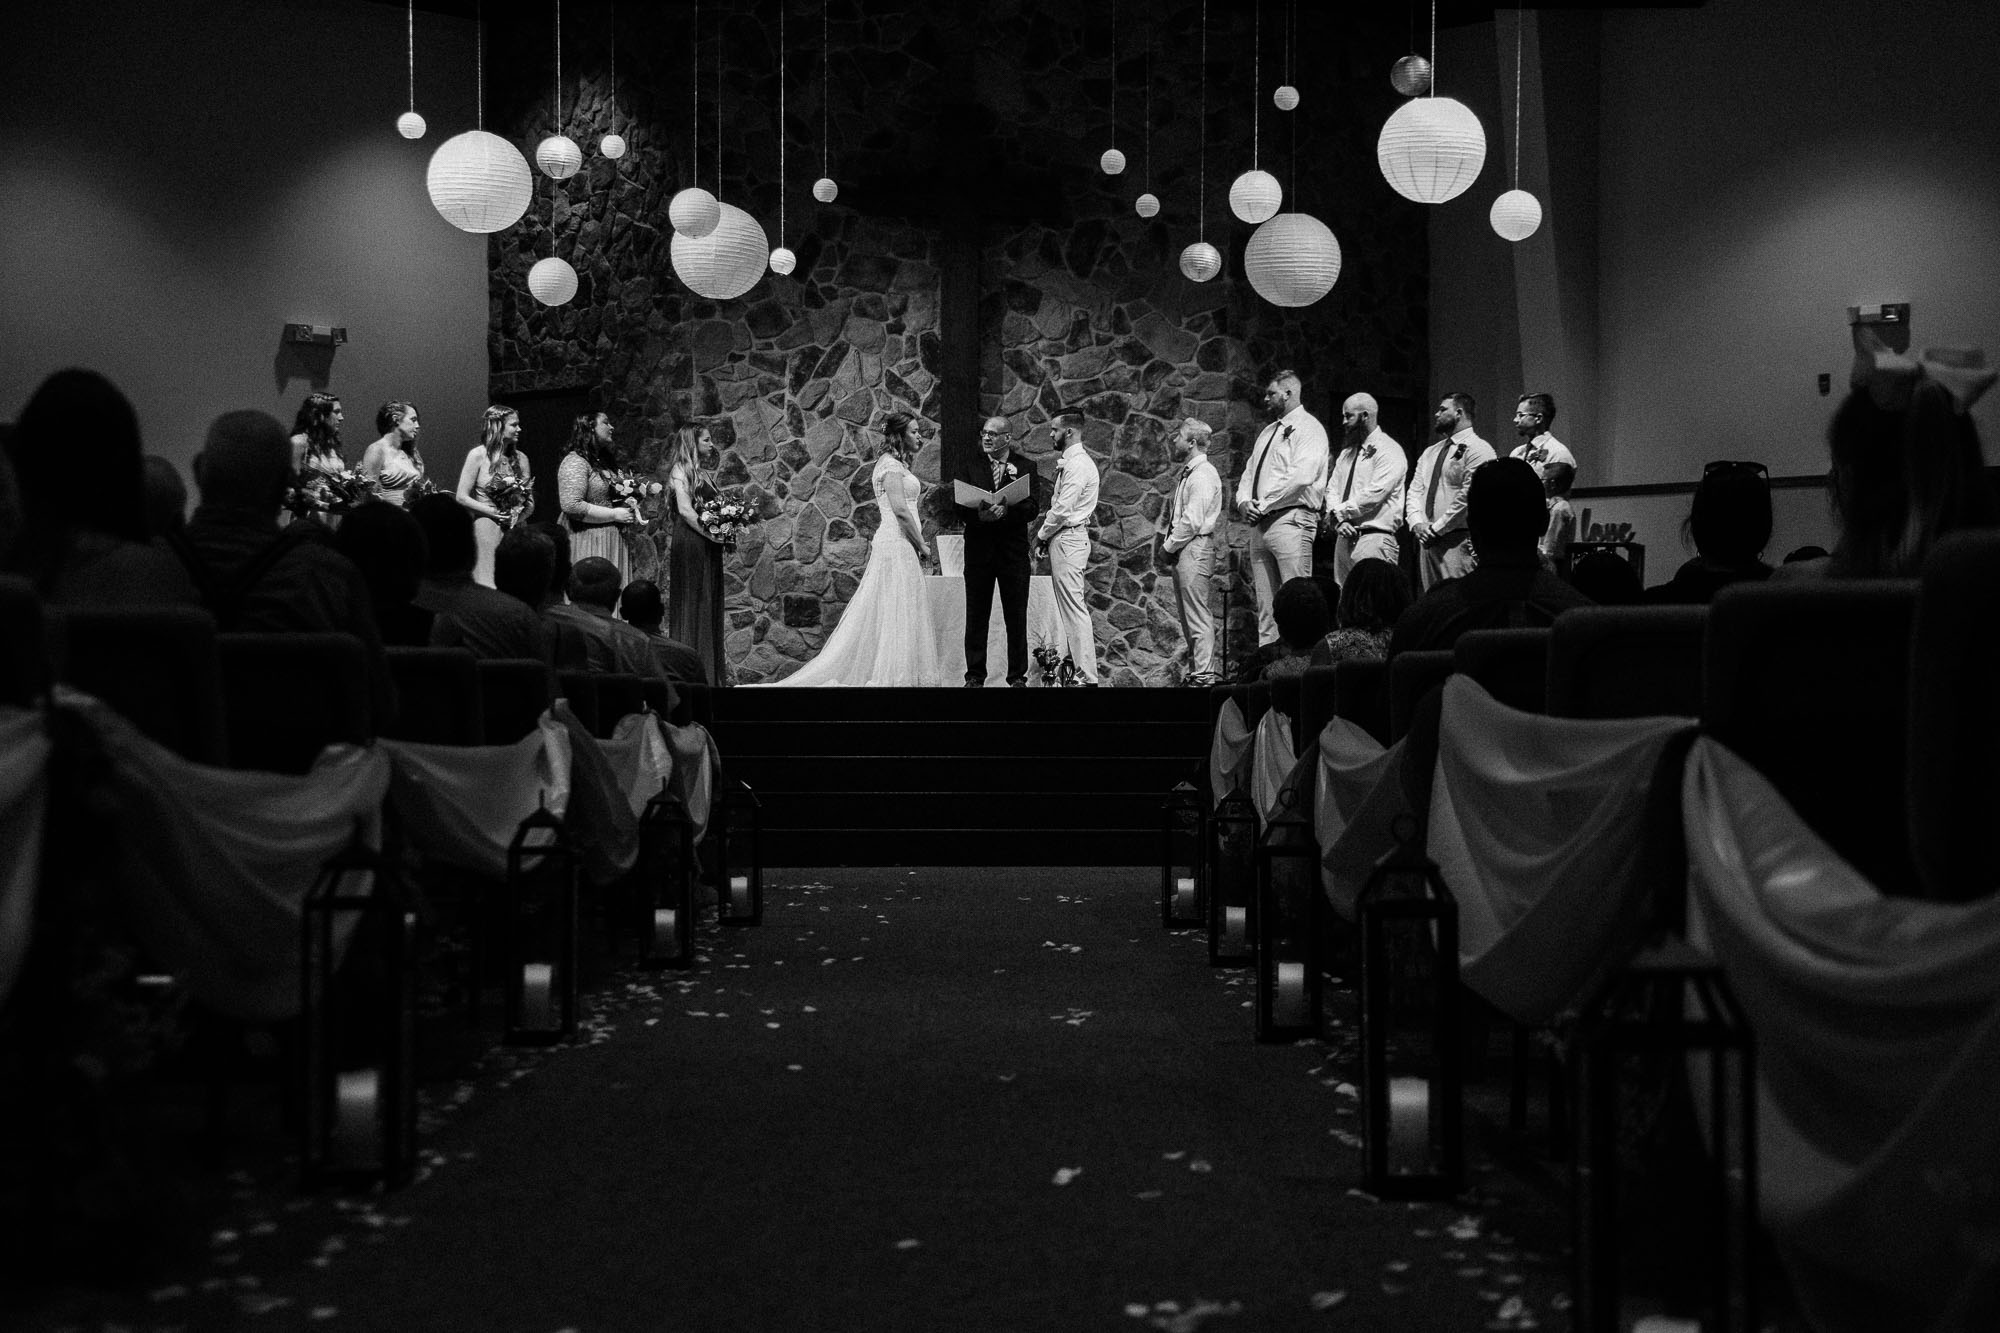 Stillwater-Christian_Church_Wedding-1682.jpg